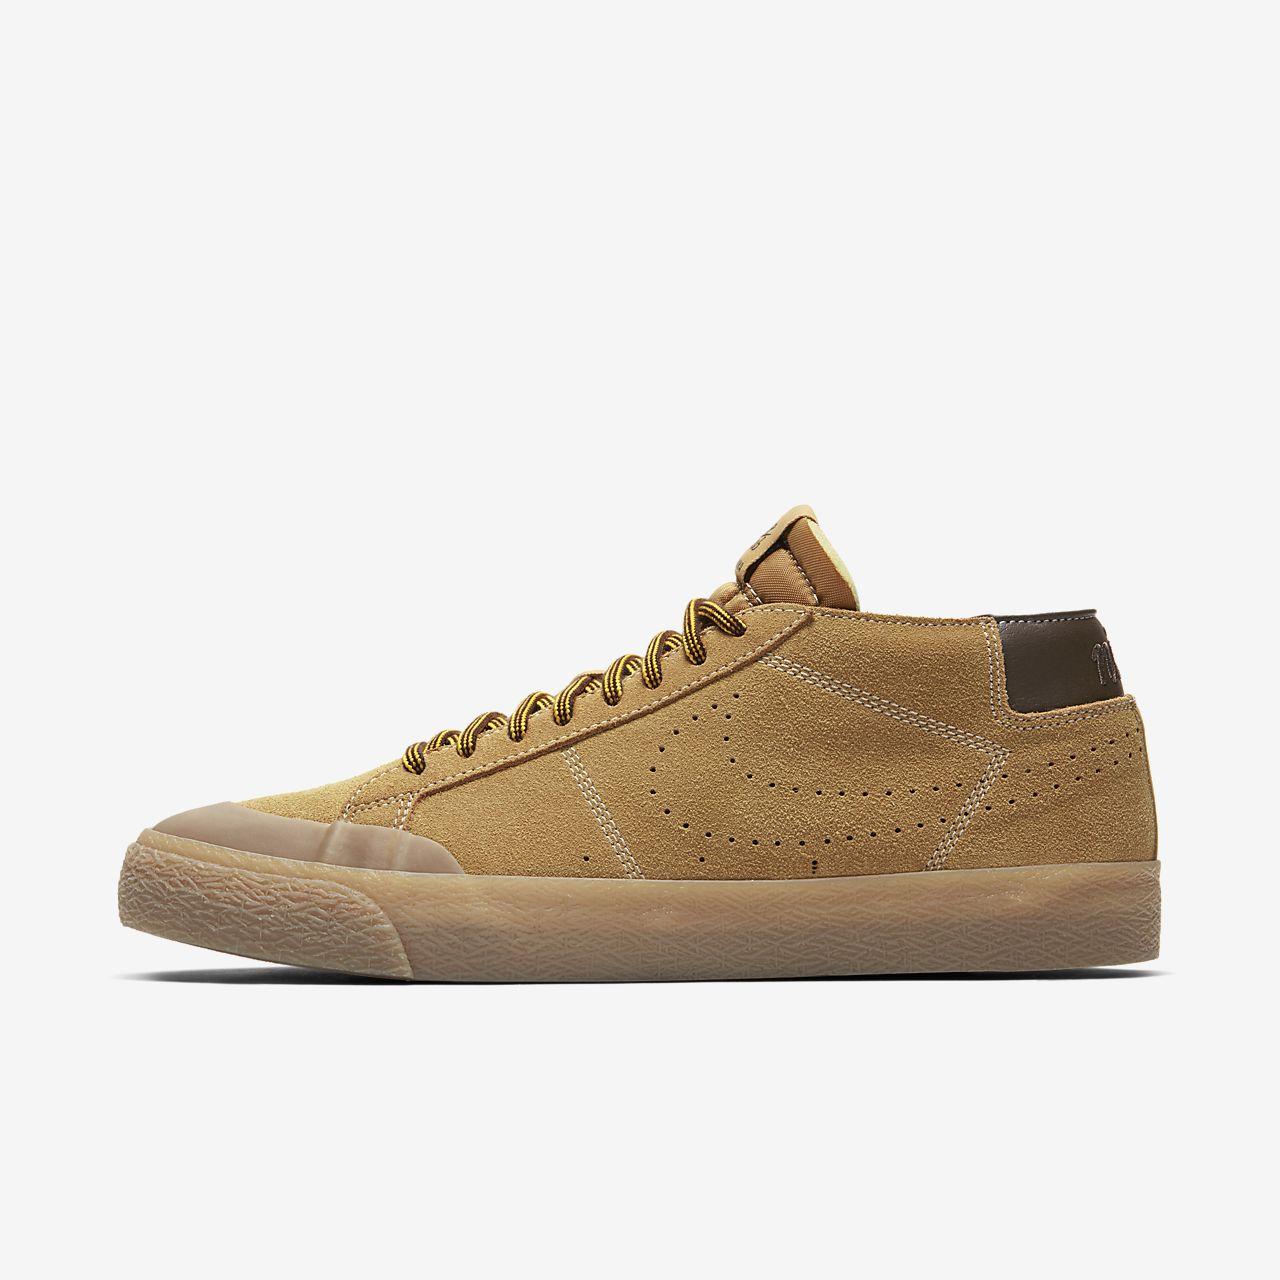 Chaussure de skateboard Nike SB Zoom Blazer Chukka XT Premium